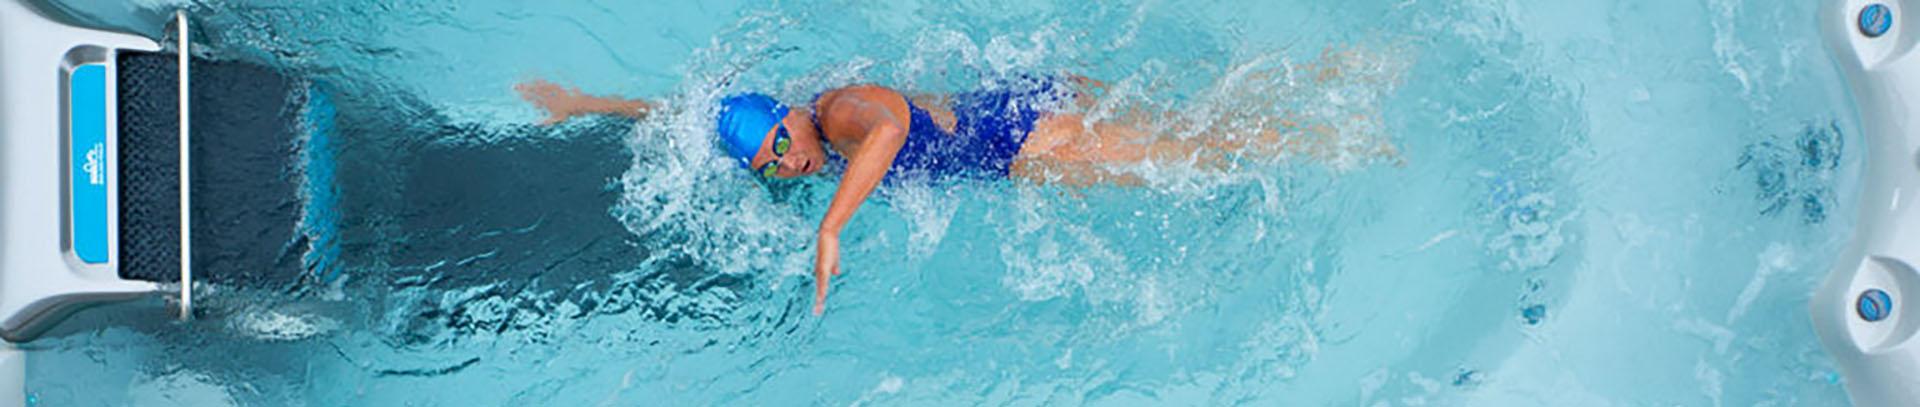 Why Choose a Swim Spa Versus Pool – Swim Spas Chino Valley